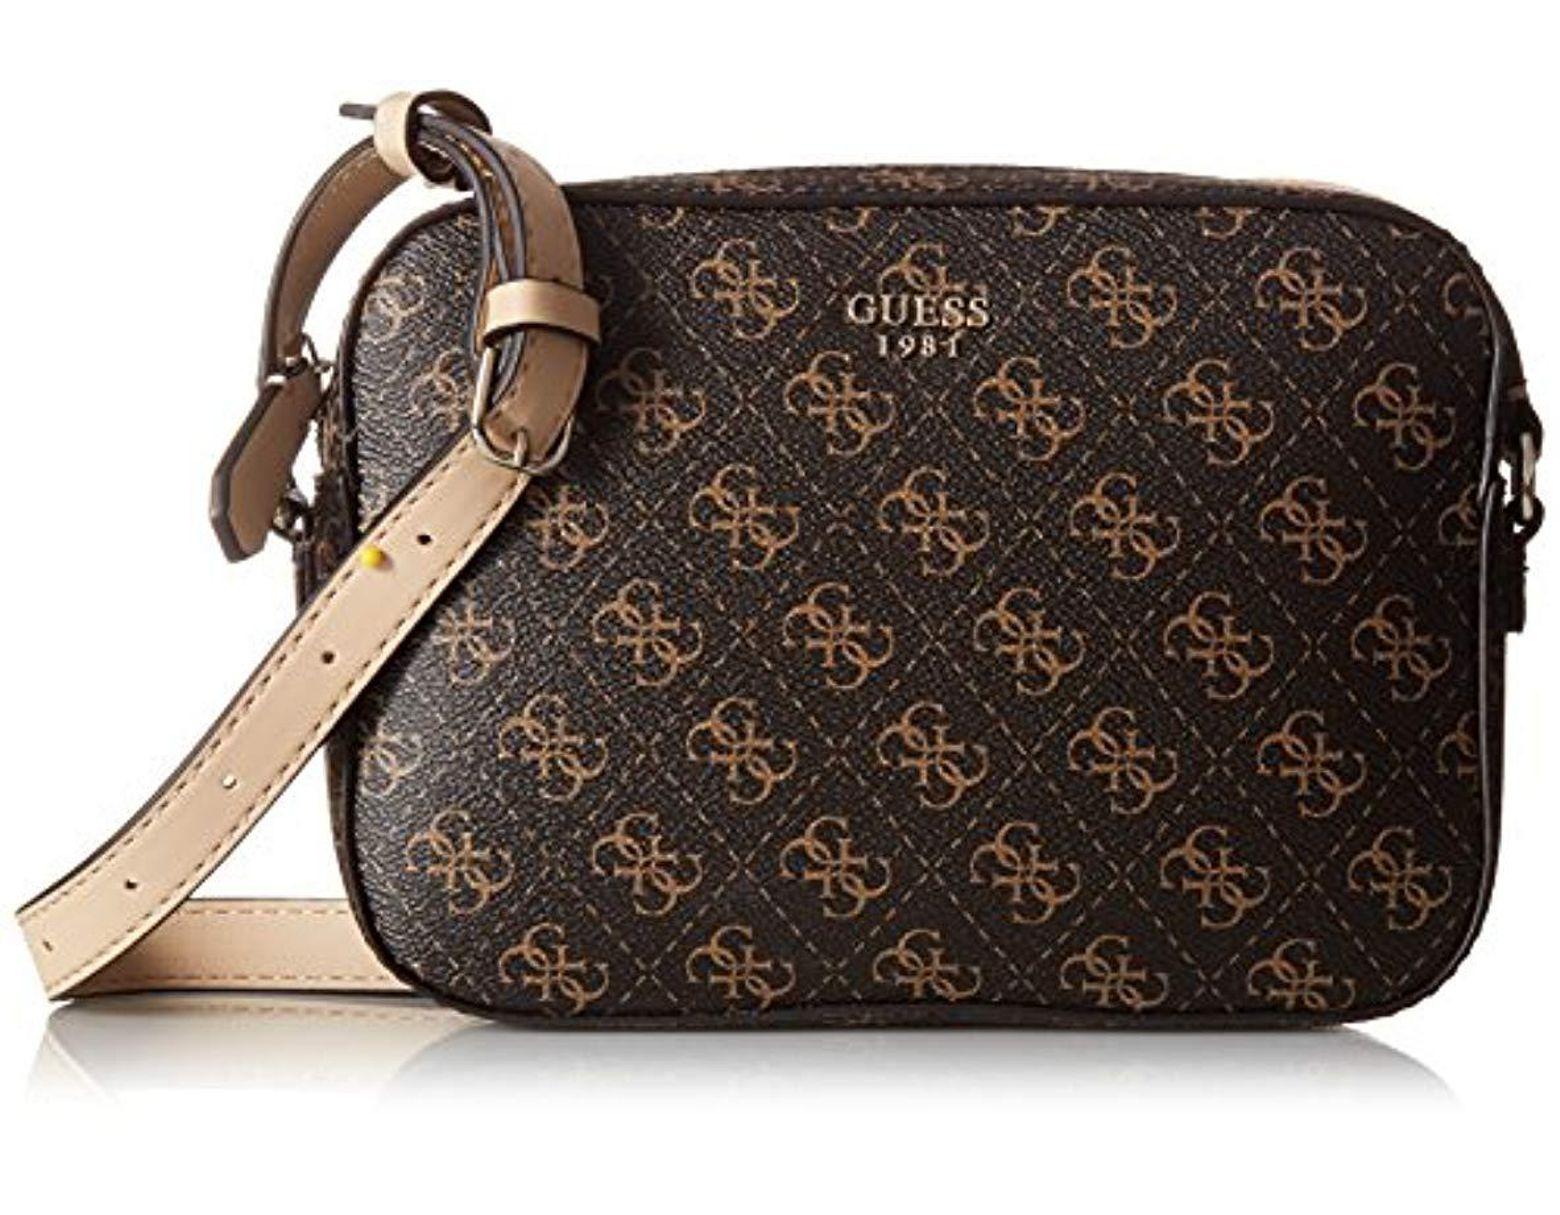 1daaa3a82d Guess Kamryn Q-logo Crossbody Top Zip in Brown - Save 17% - Lyst